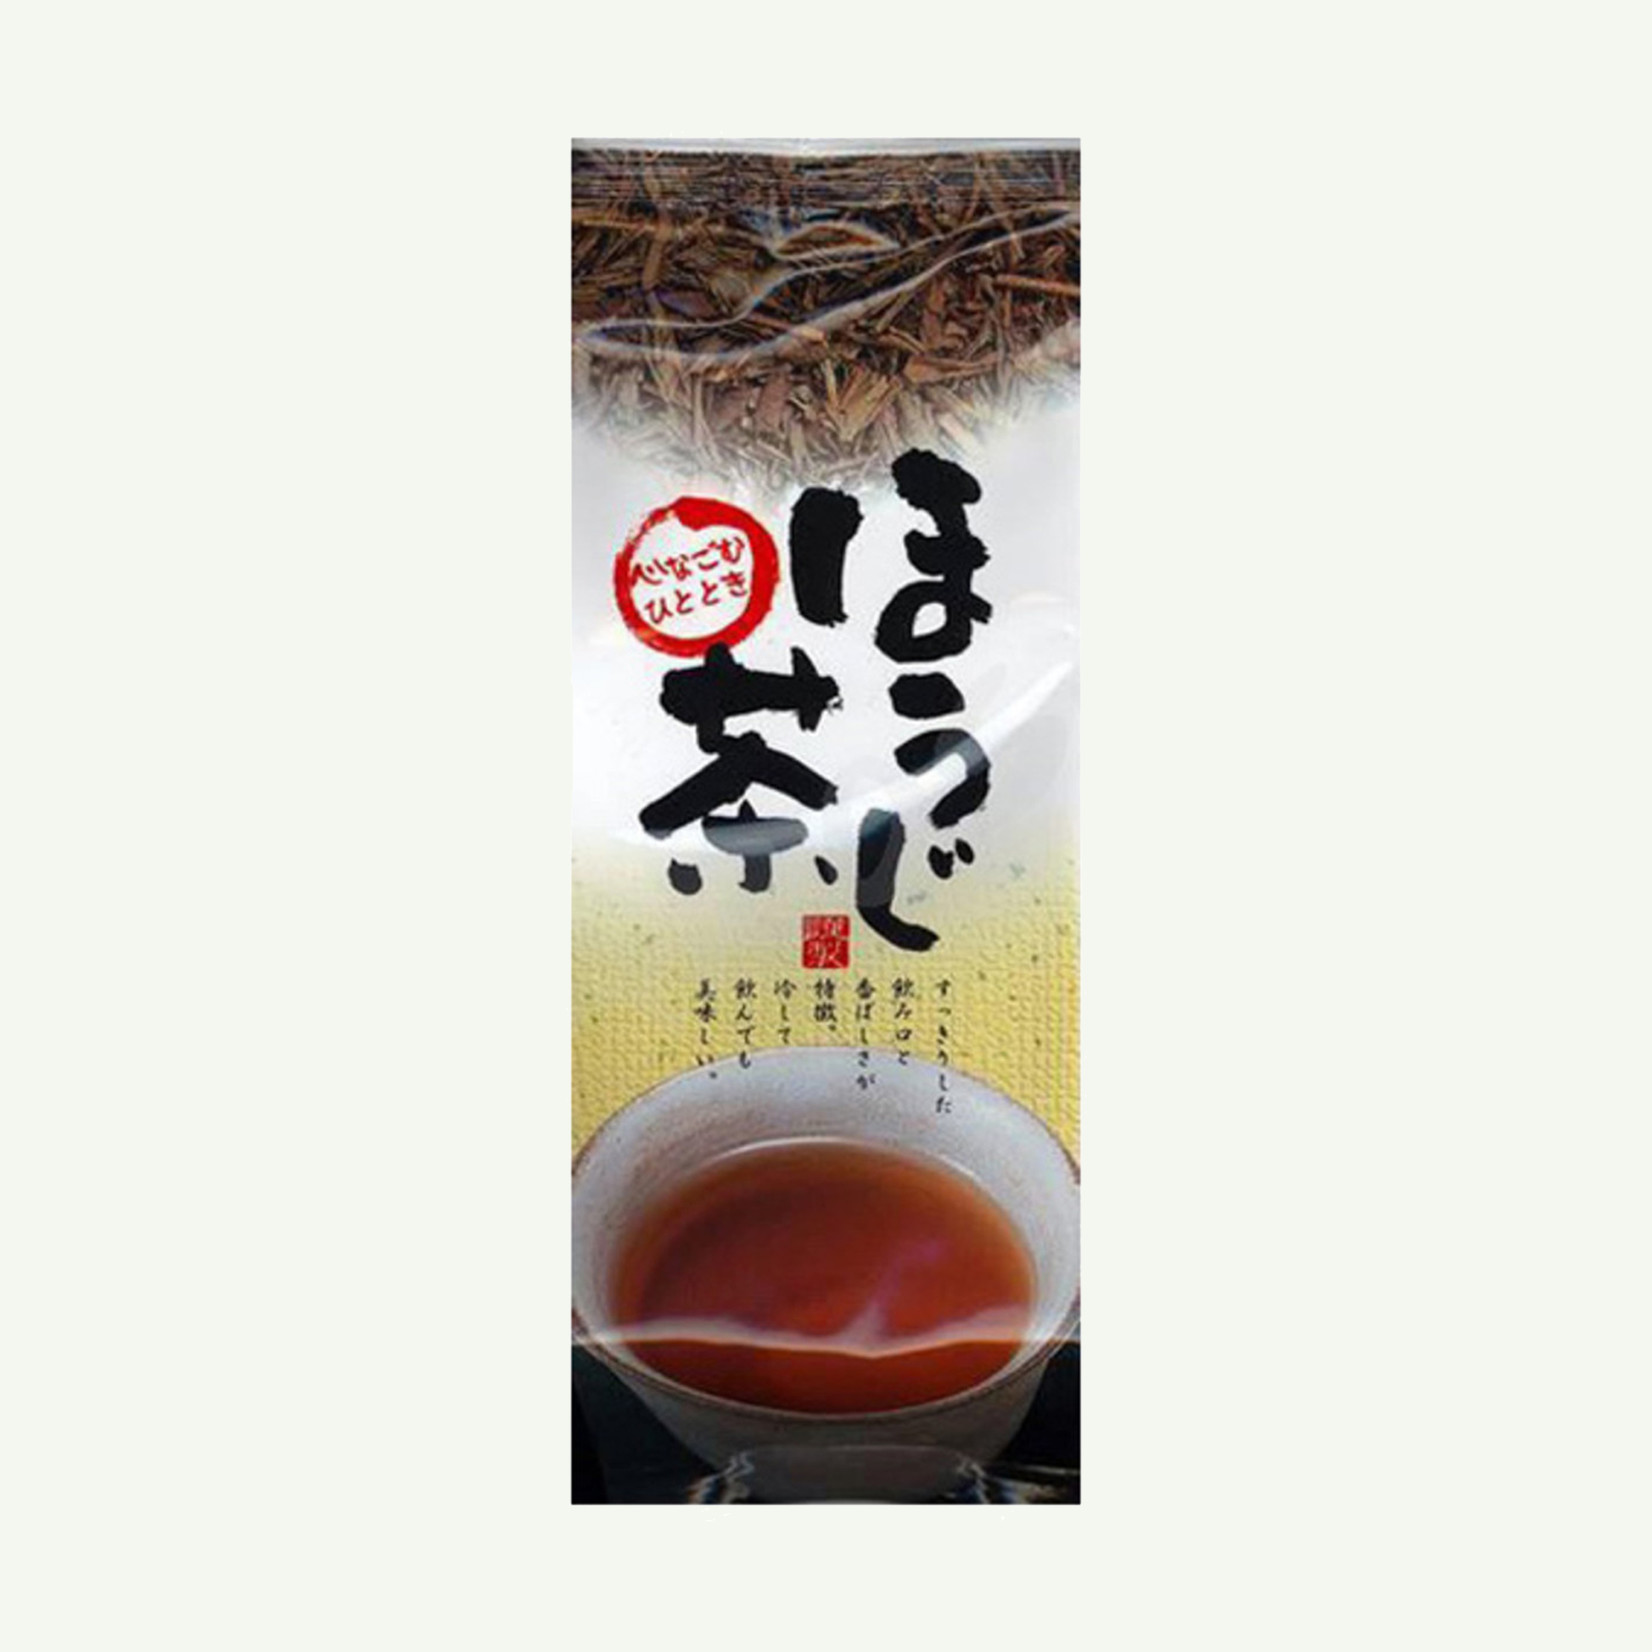 Japan Hojicha Hoshino 100g - Losse thee